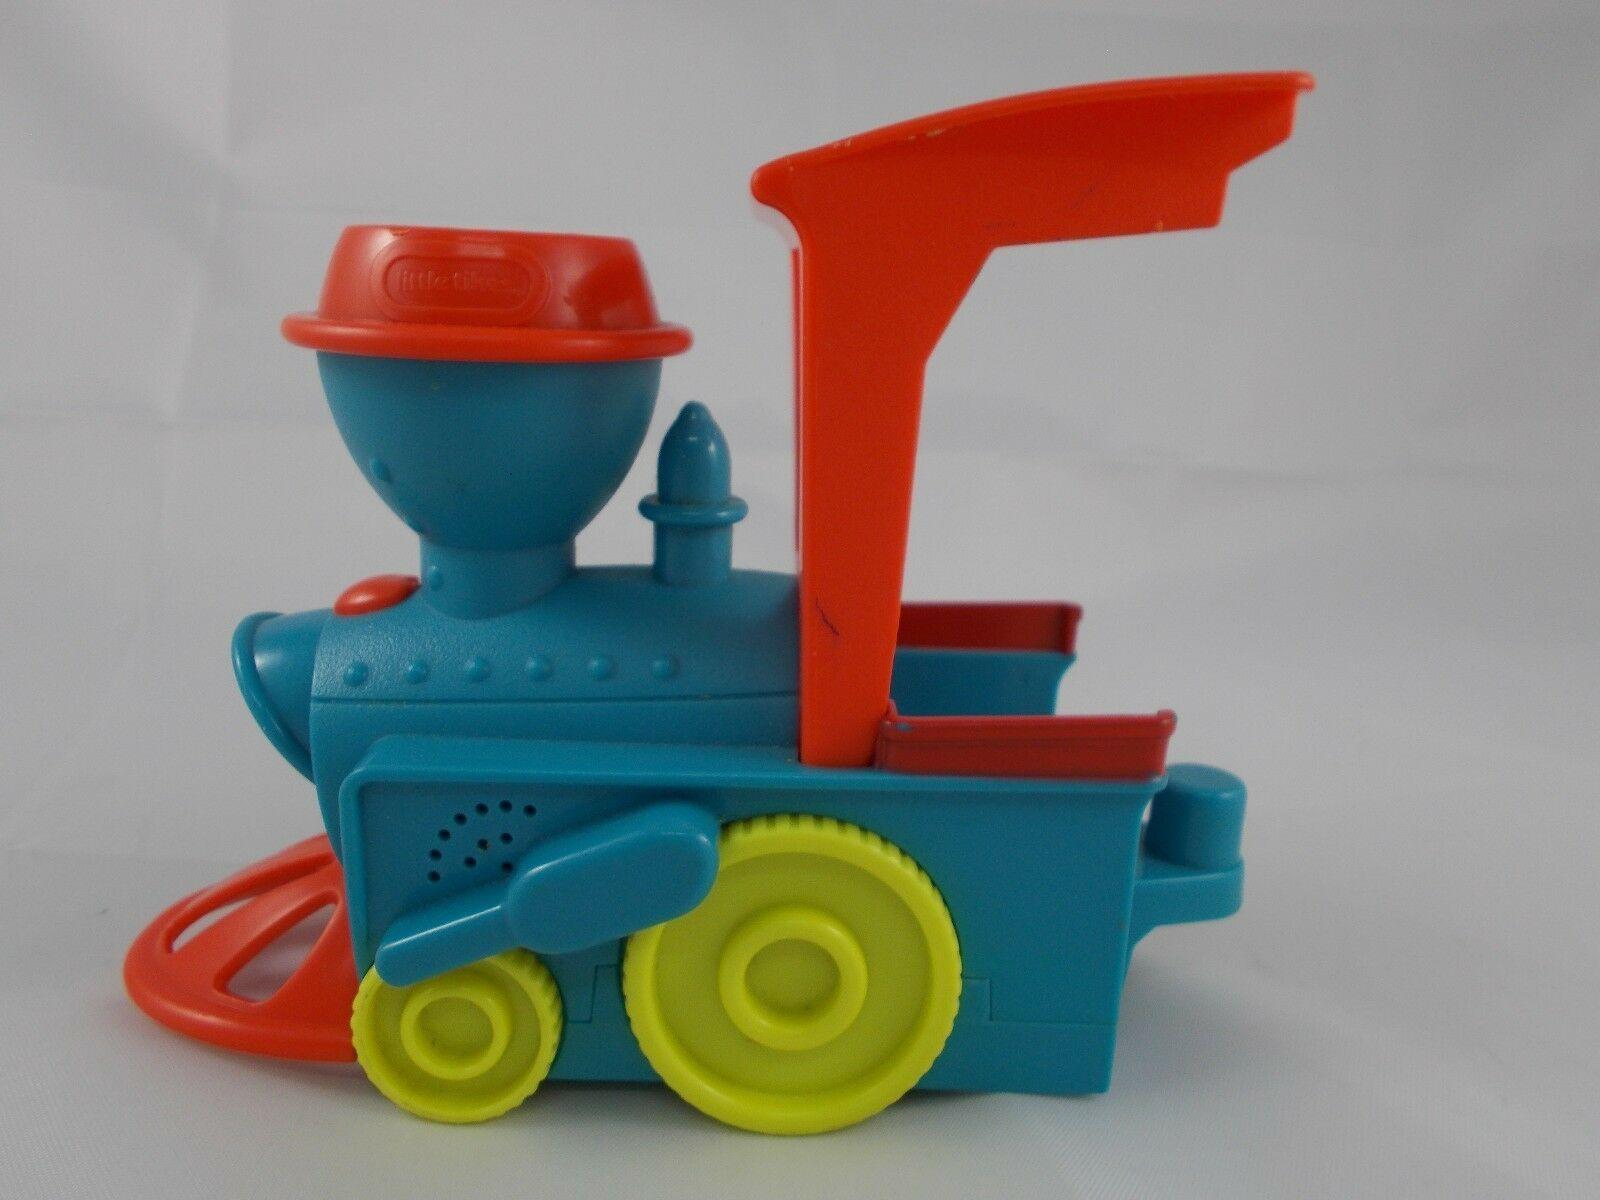 "Little Tikes Little Apple Grove Train Engine Musical 5"" Tall - $4.95"